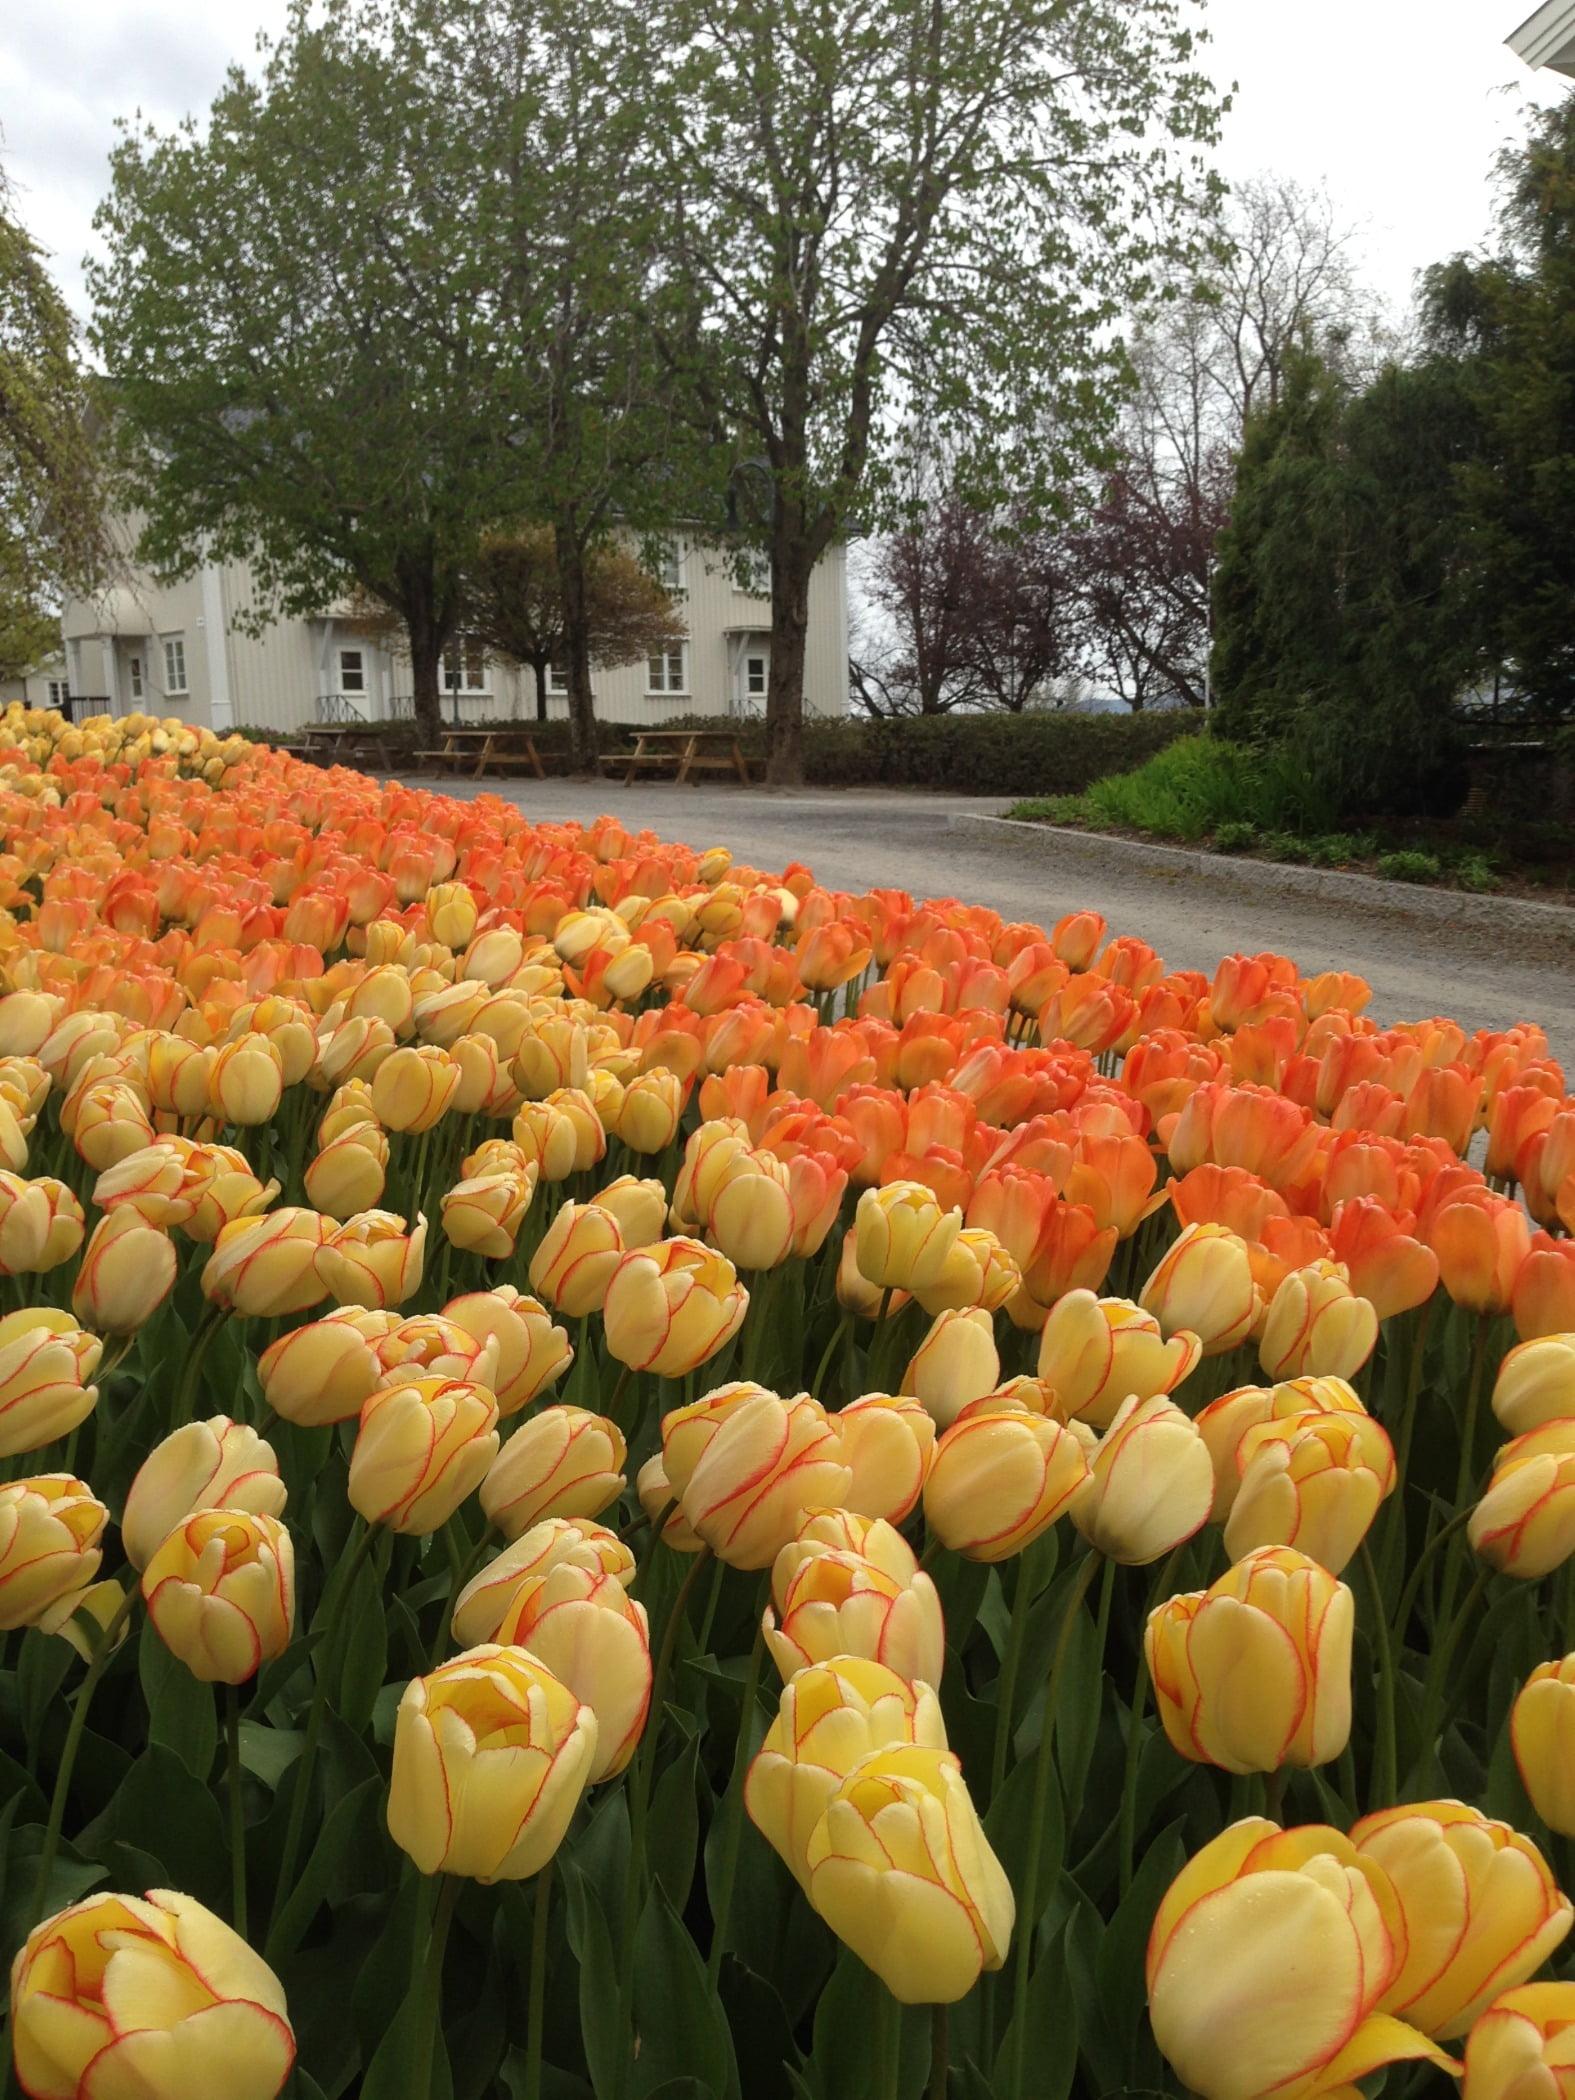 Natural environment, Botany, Orange, Garden, Leaf, Tree, Flower, Petal, Yellow, Plant